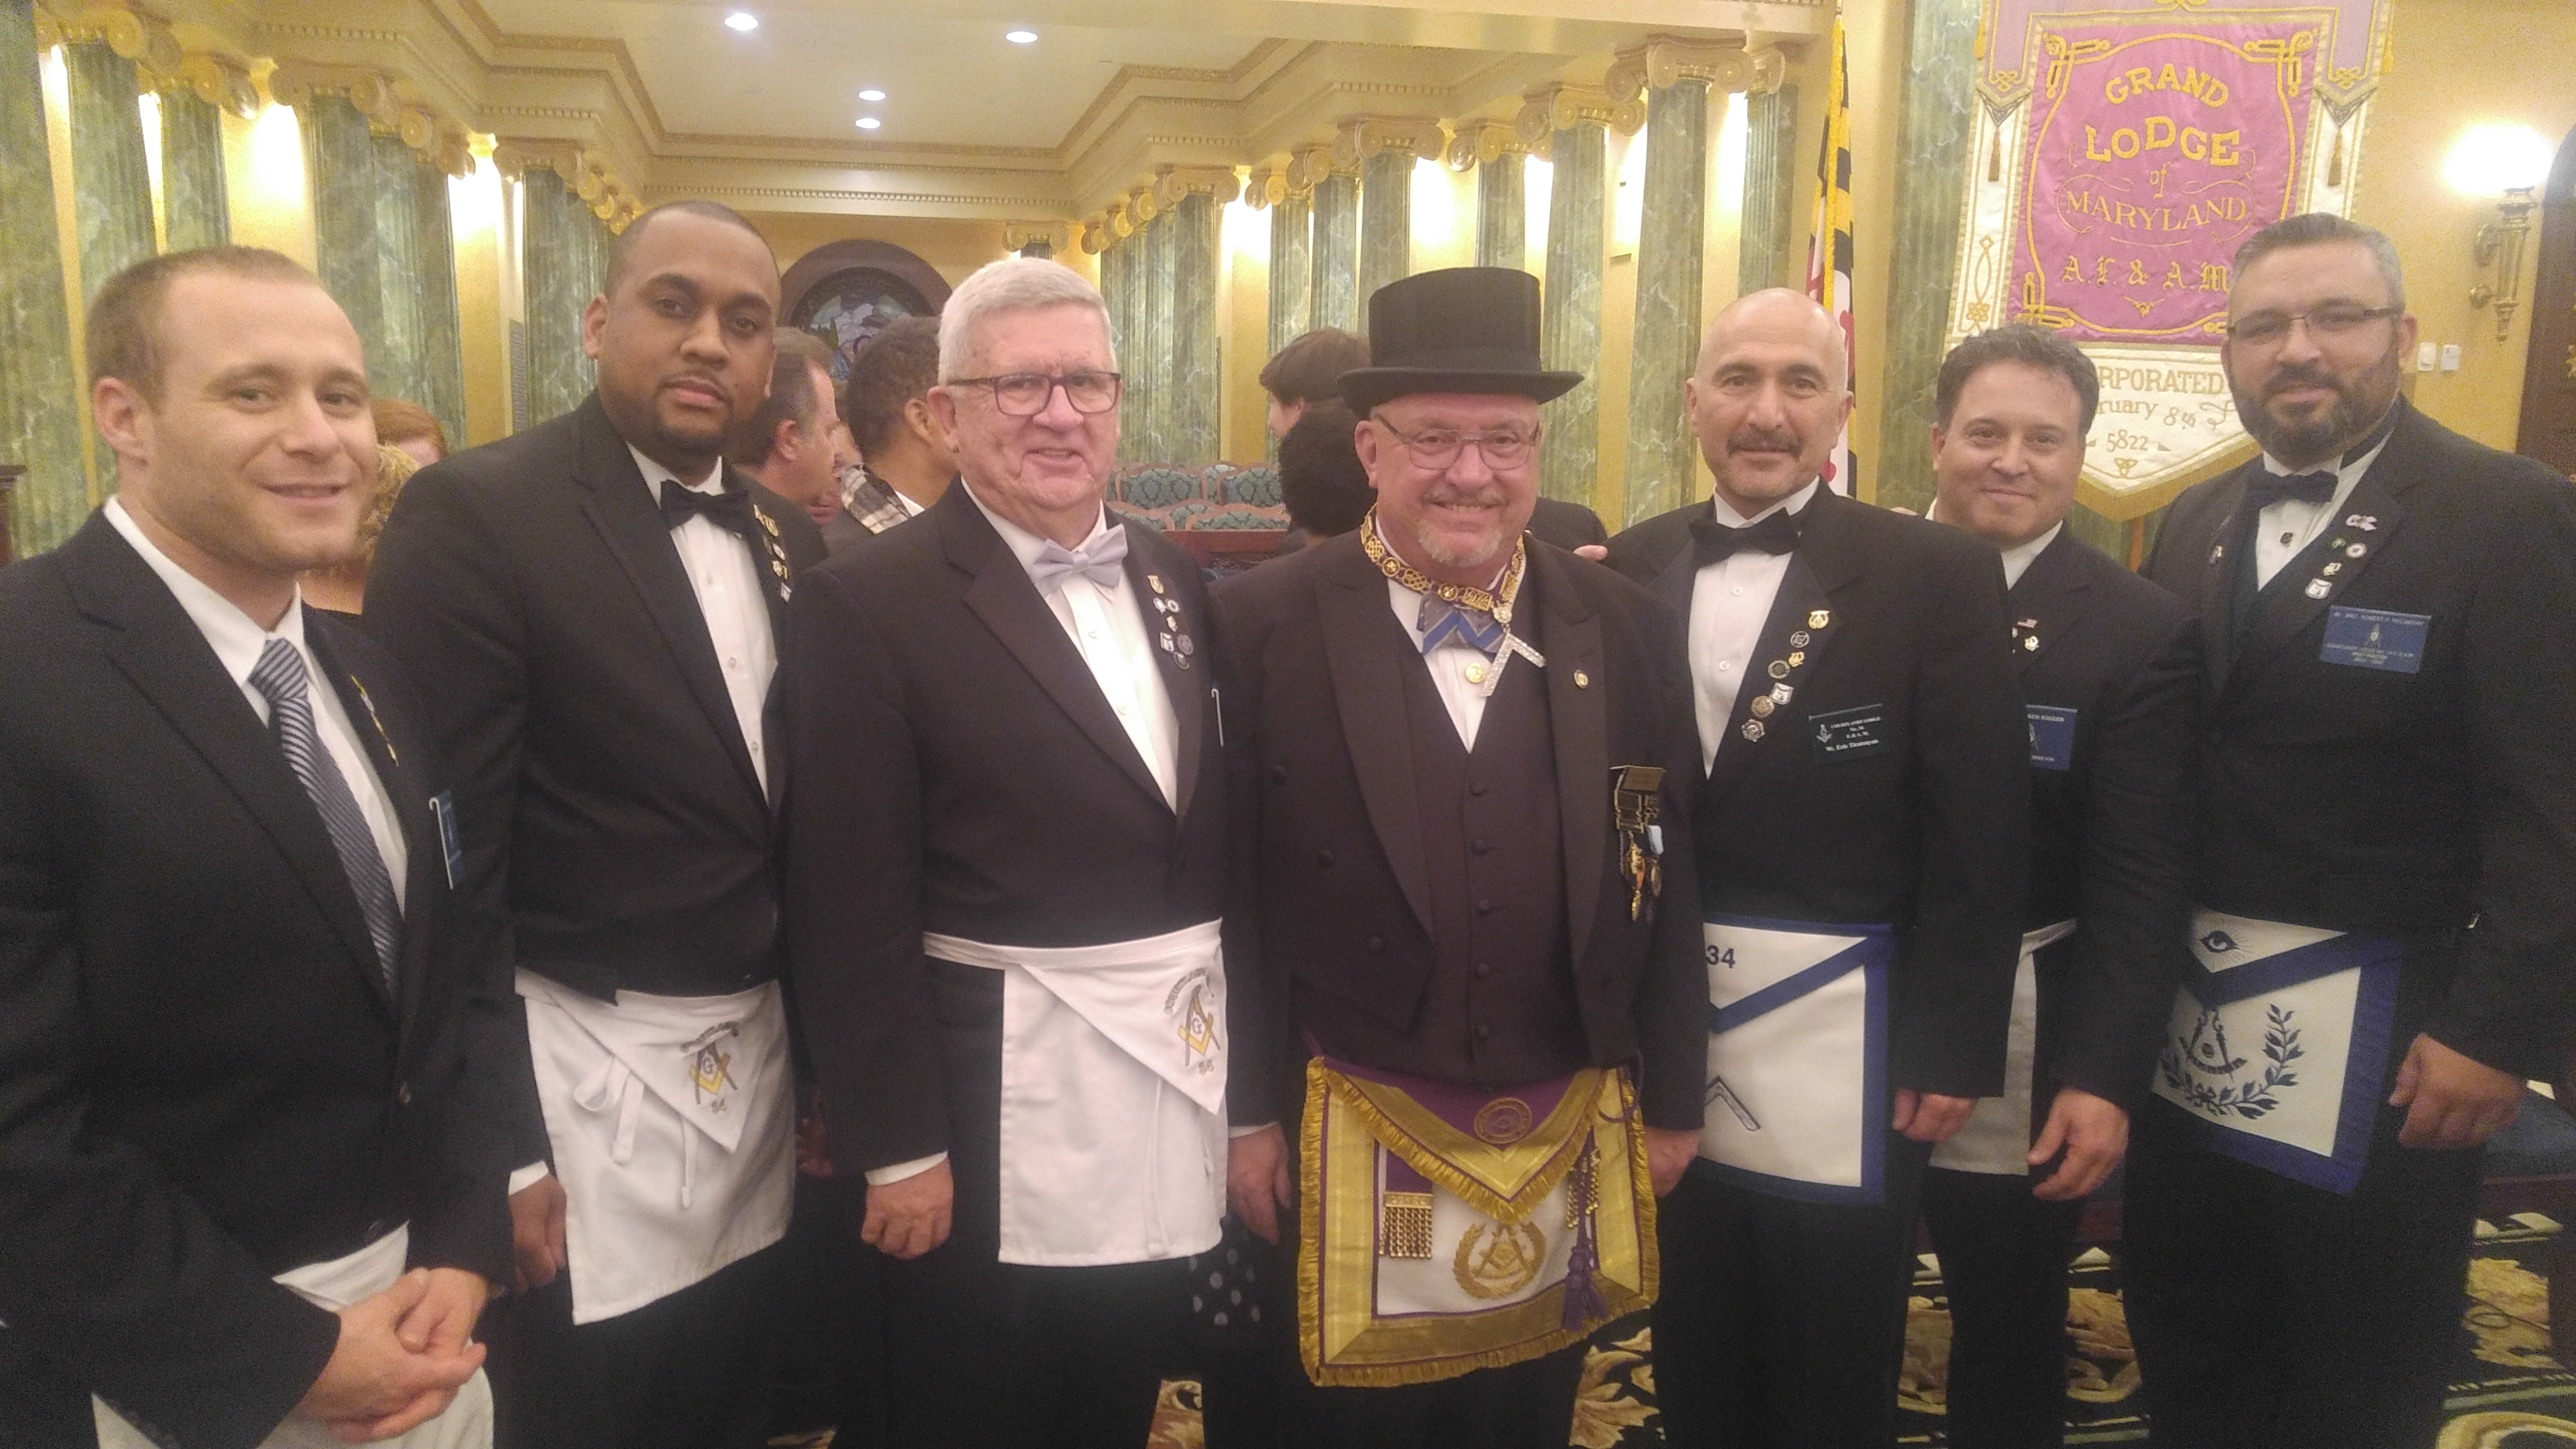 MD_annual_2016 | Freemasonry | Verplanck | Courtlandt Lodge